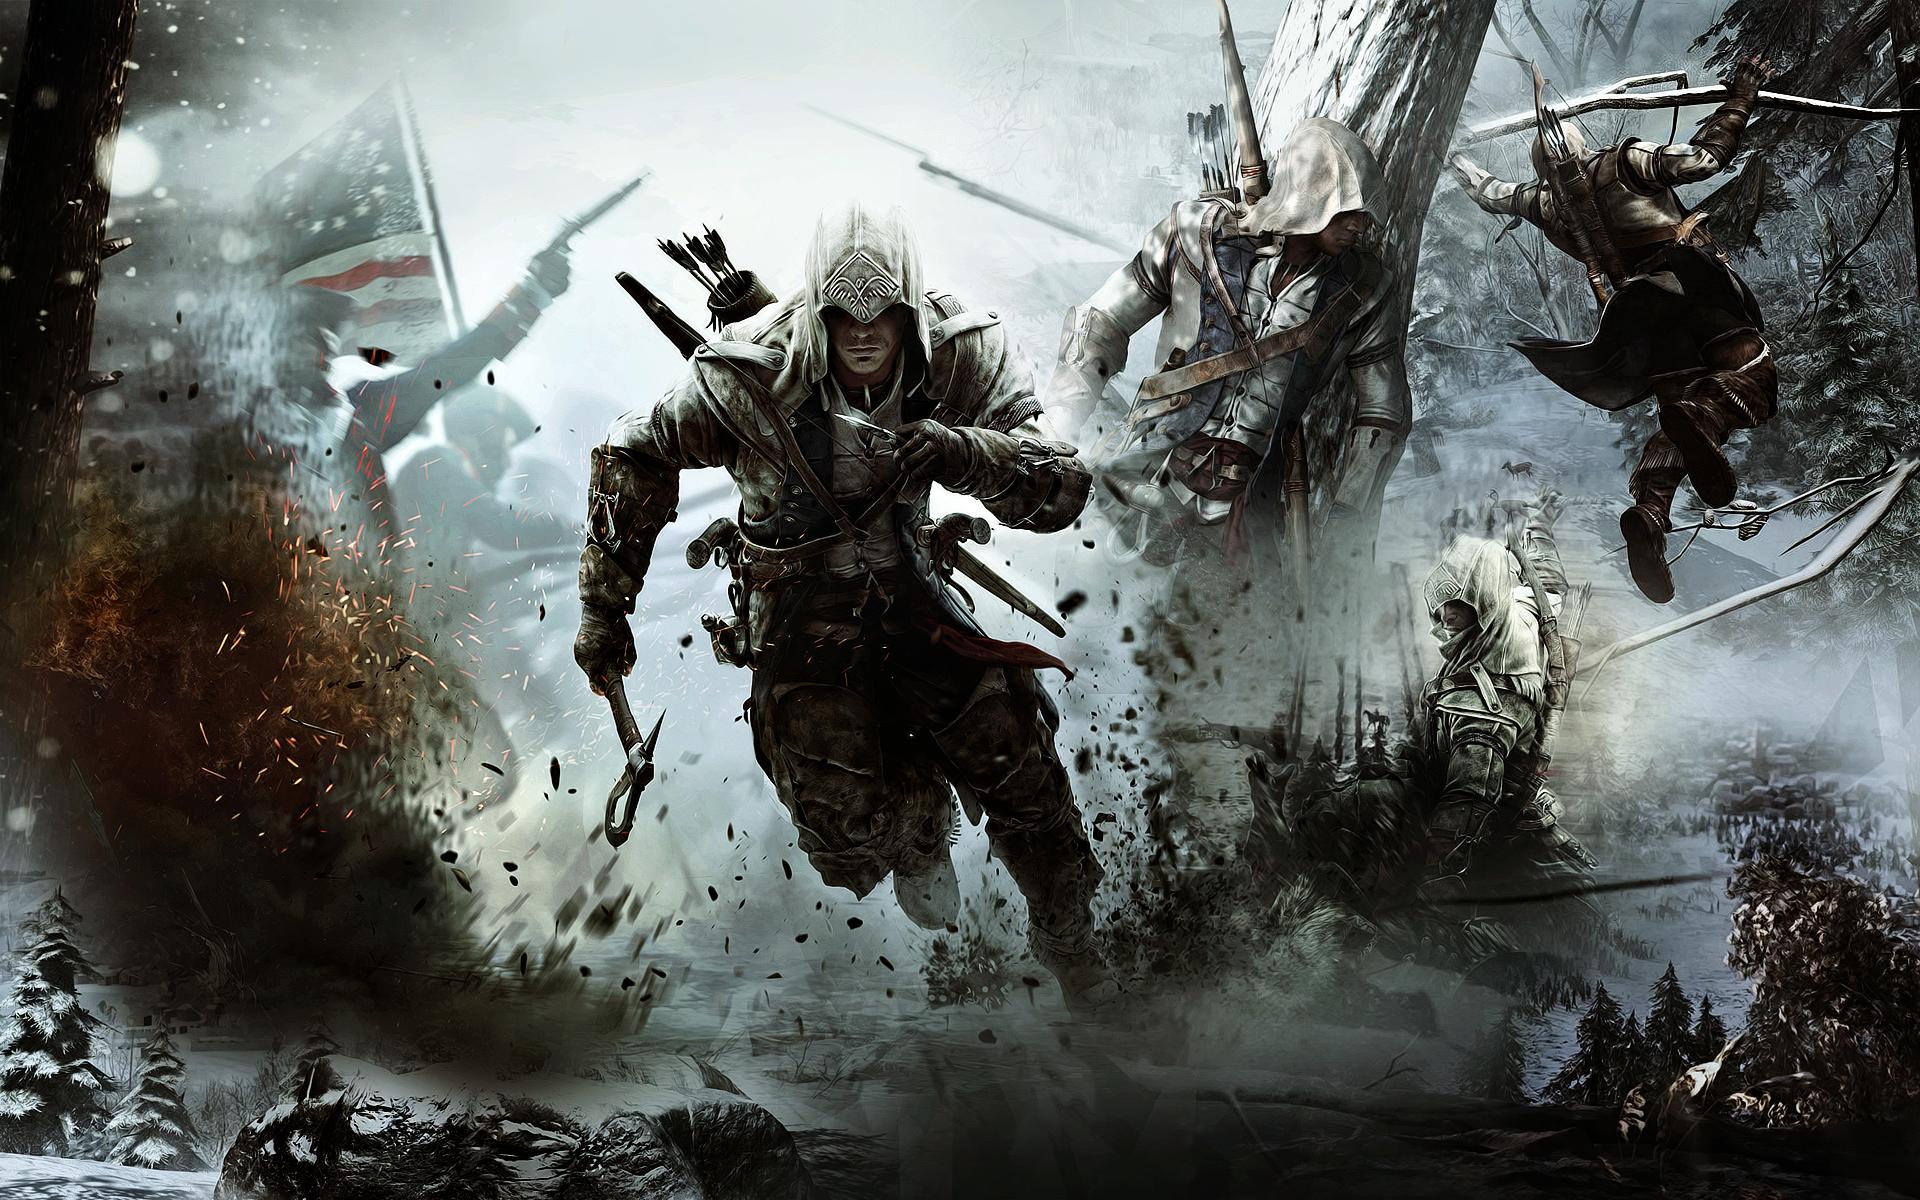 Assassins Creed Creed III Wallpaper 1920x1200